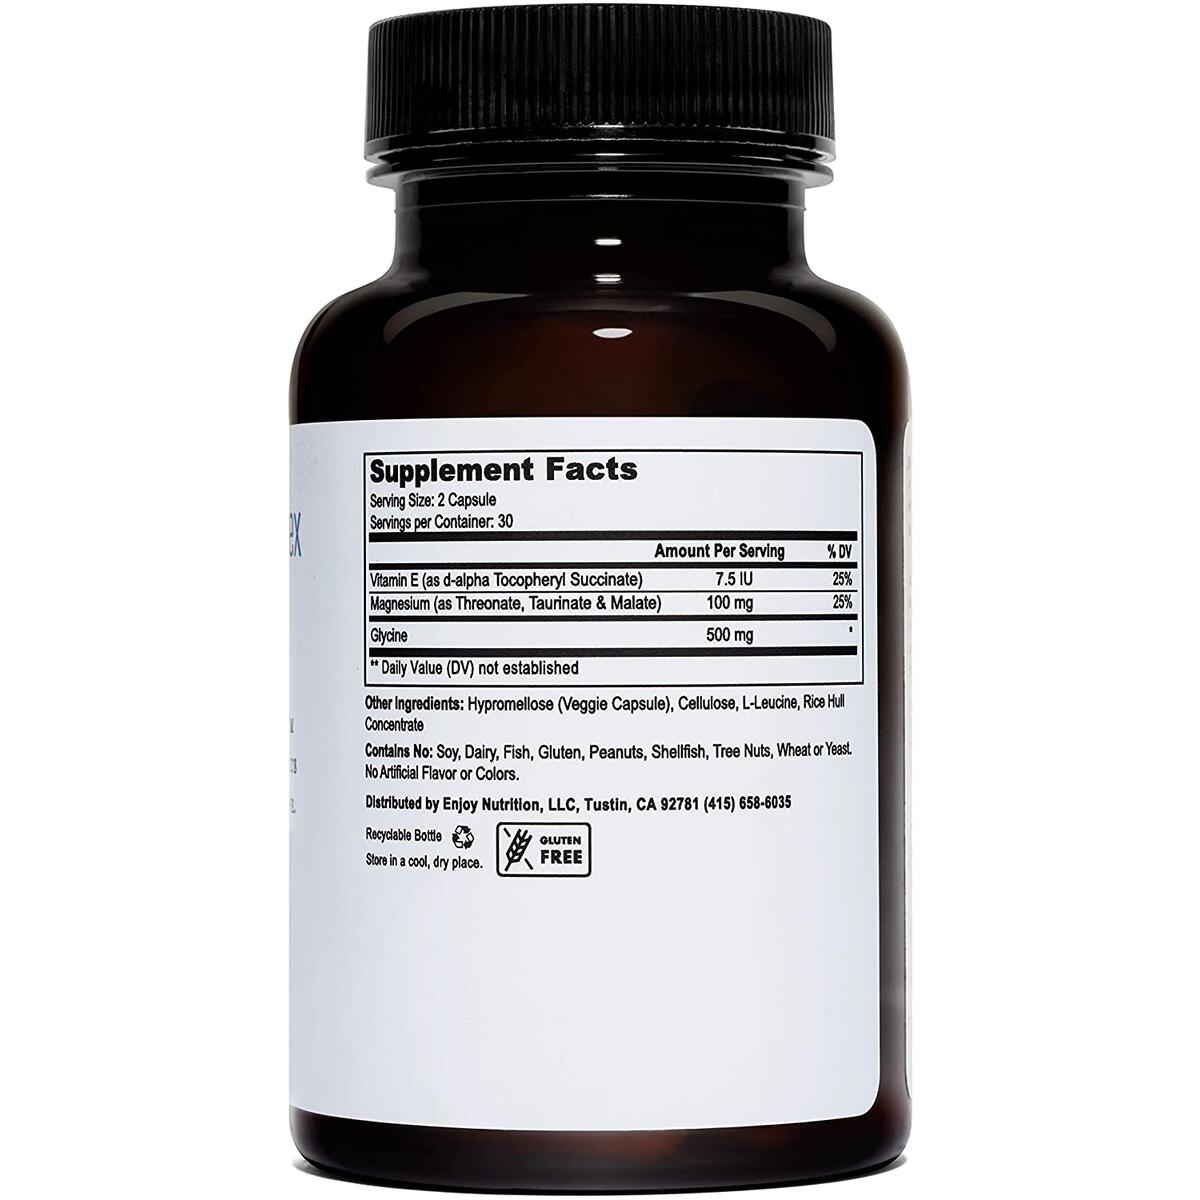 Weyland Tri-Magnesium Complex with Vitamin E